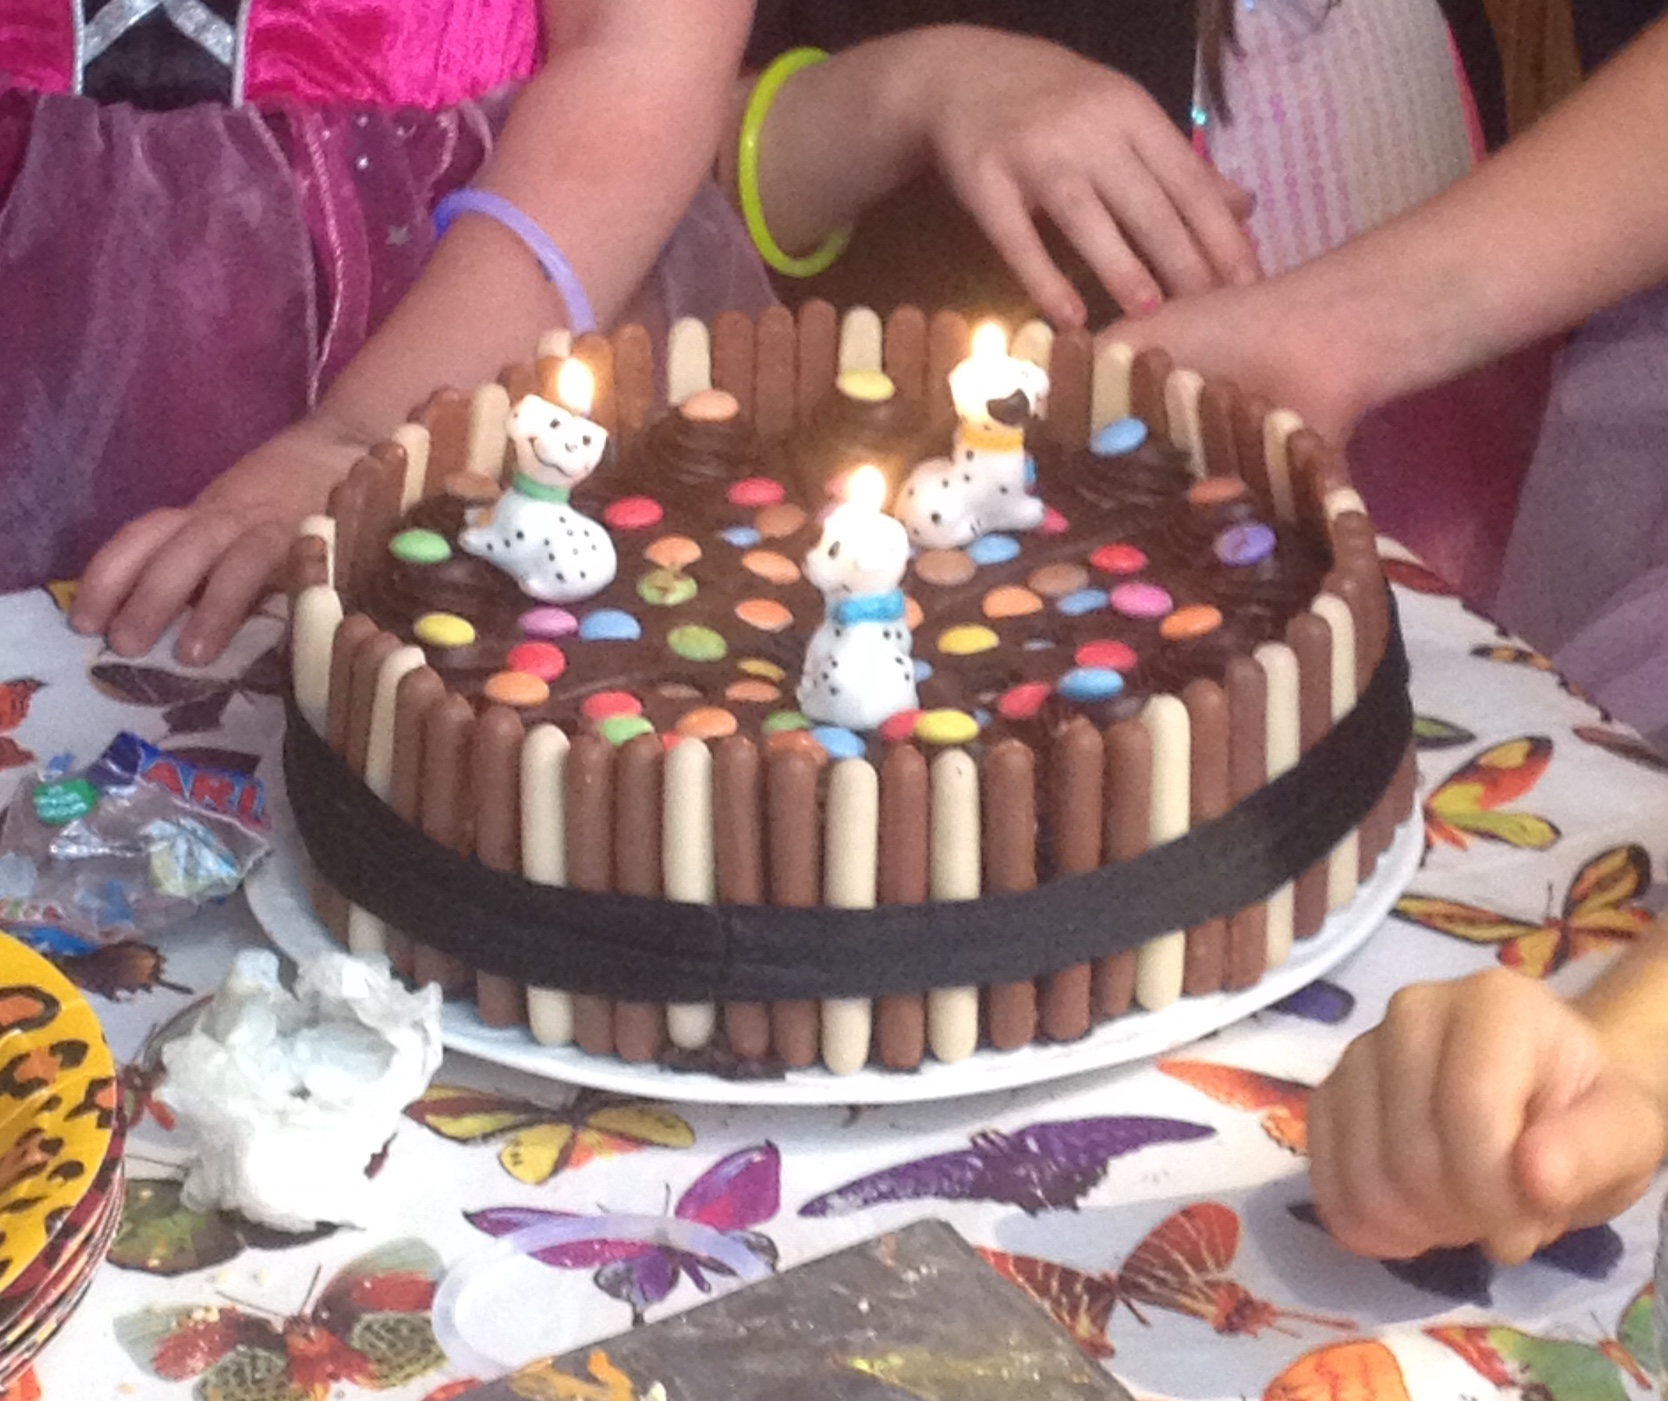 children's birthday party cake